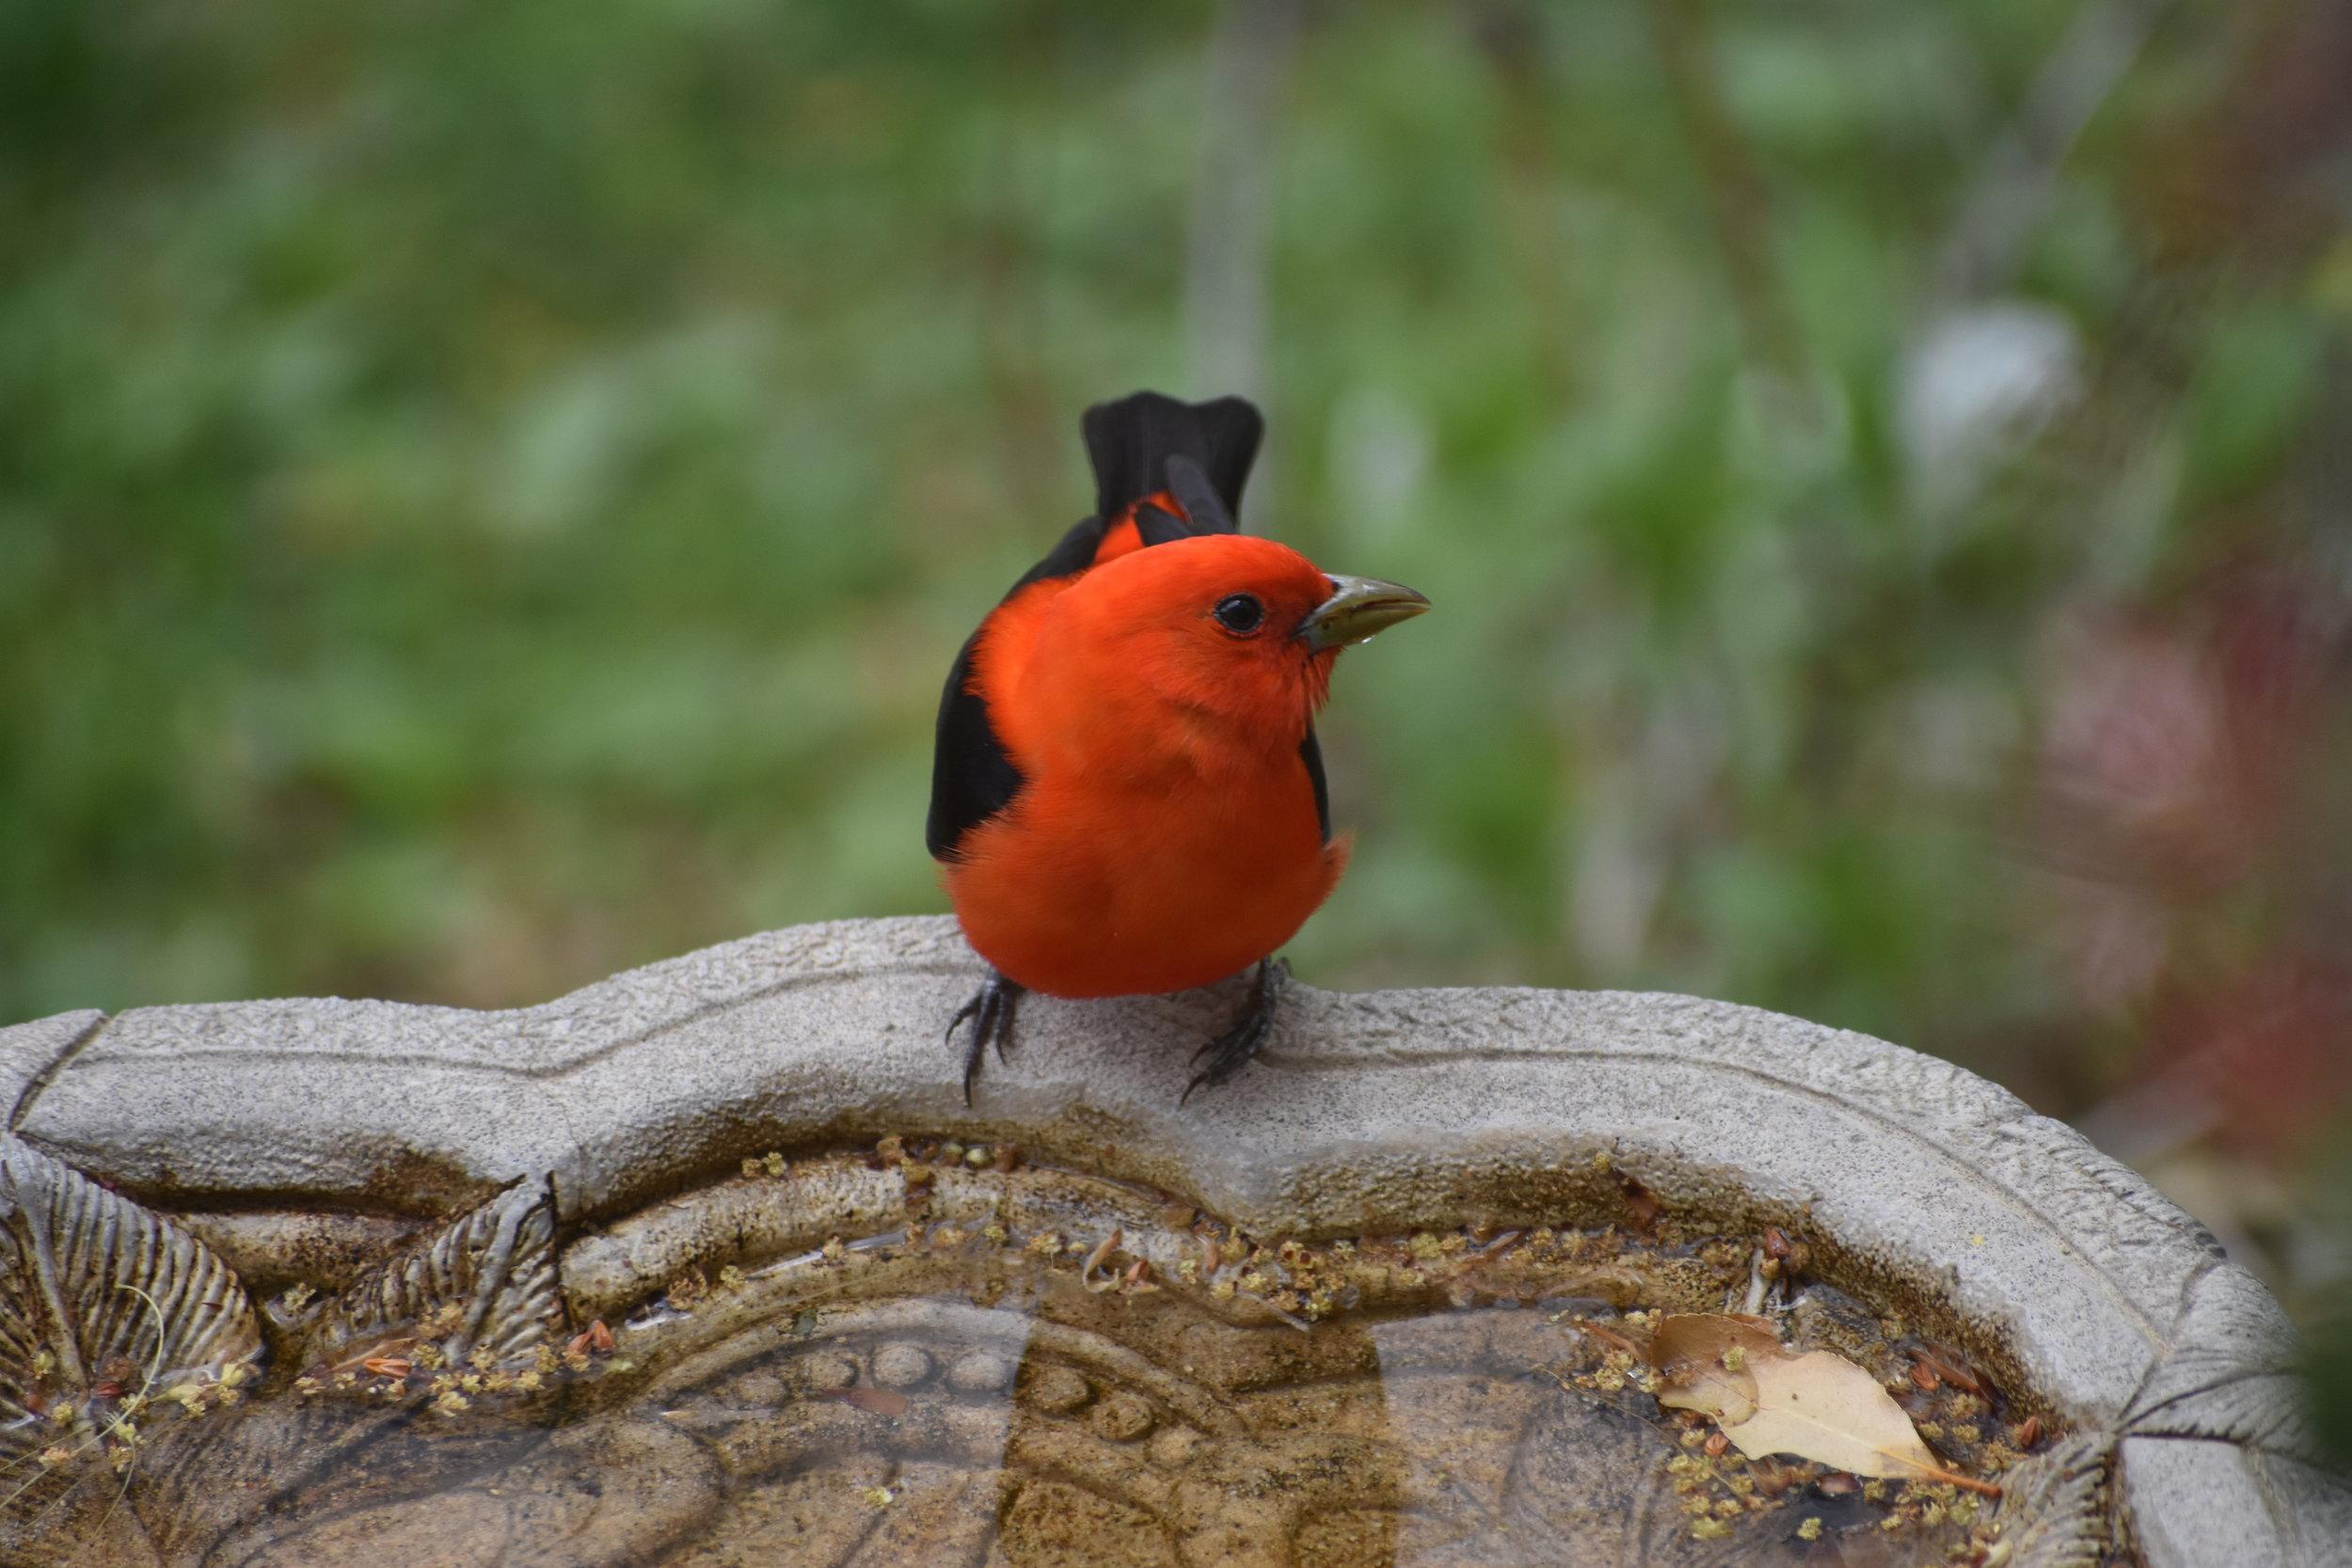 Scarlet Tanager at birdbath